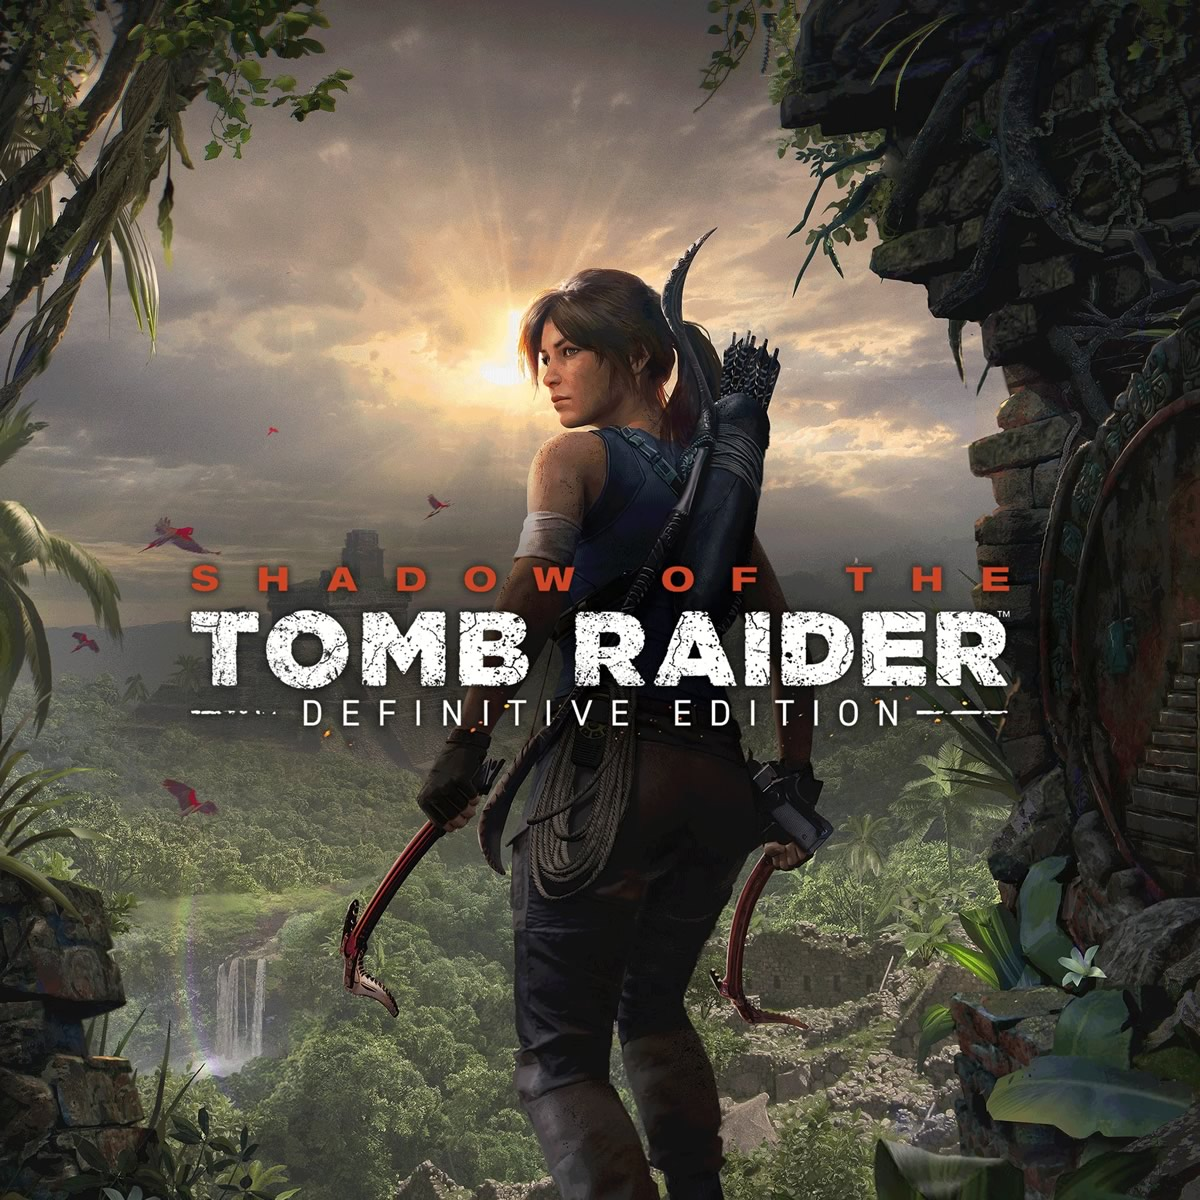 Lara Croft Anime Netflix Shadow of the Tomb Raider - Lara Croft   Anime da Netflix terá a voz da atriz Hayley Atwell, a agente Peggy Carter da Marvel, em sua protagonista